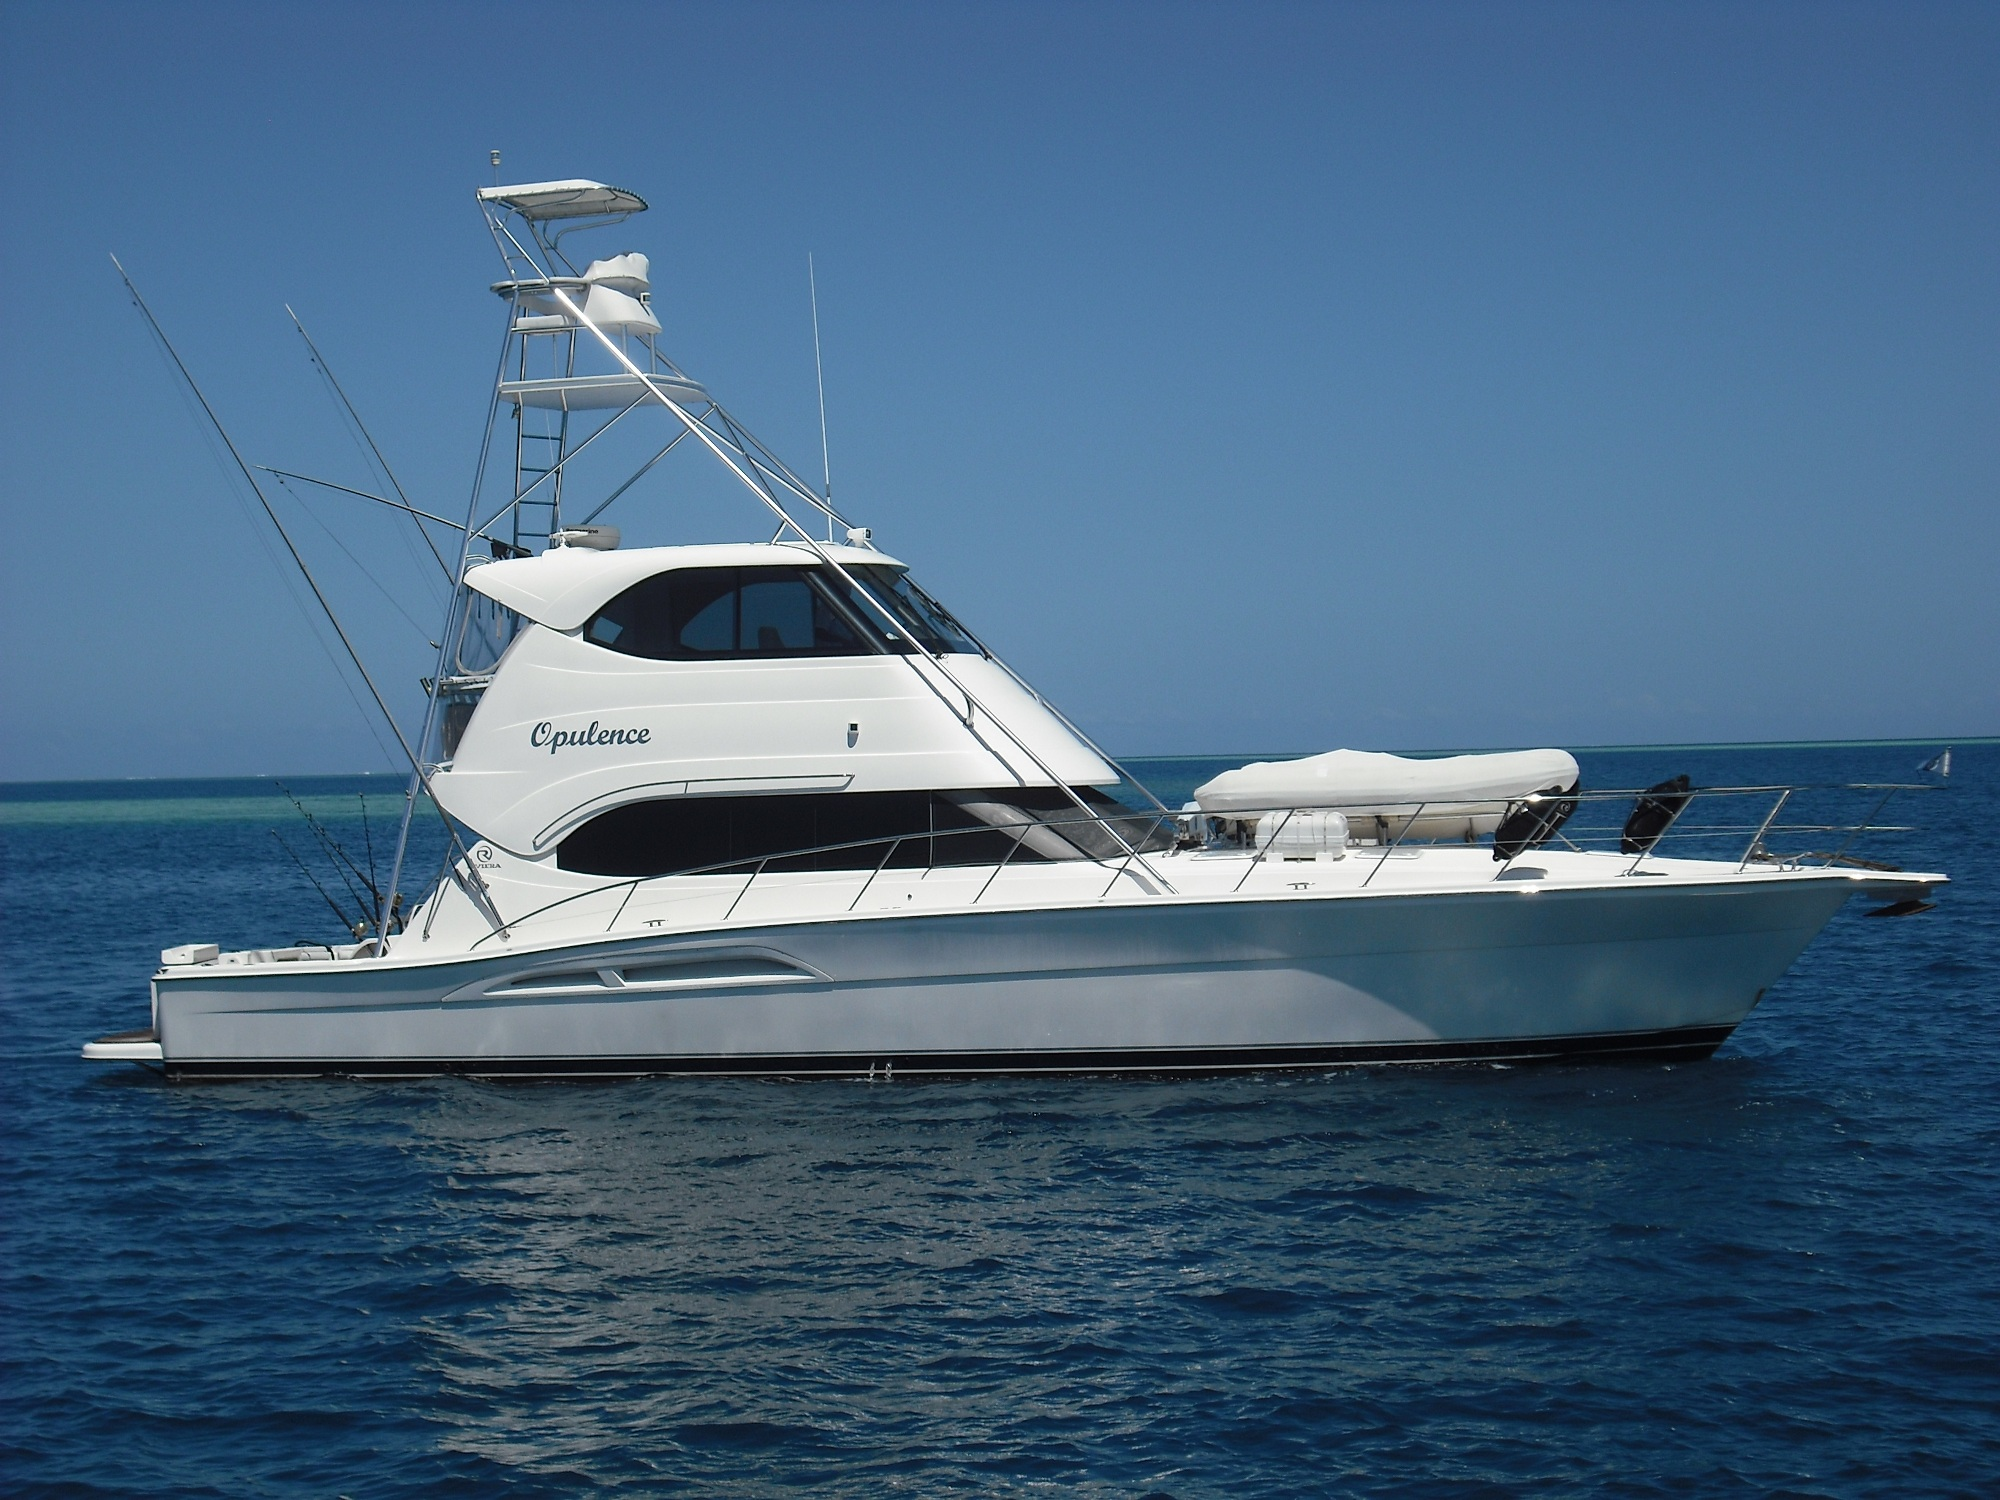 Fiji Yacht Charter Deep Sea Fishing